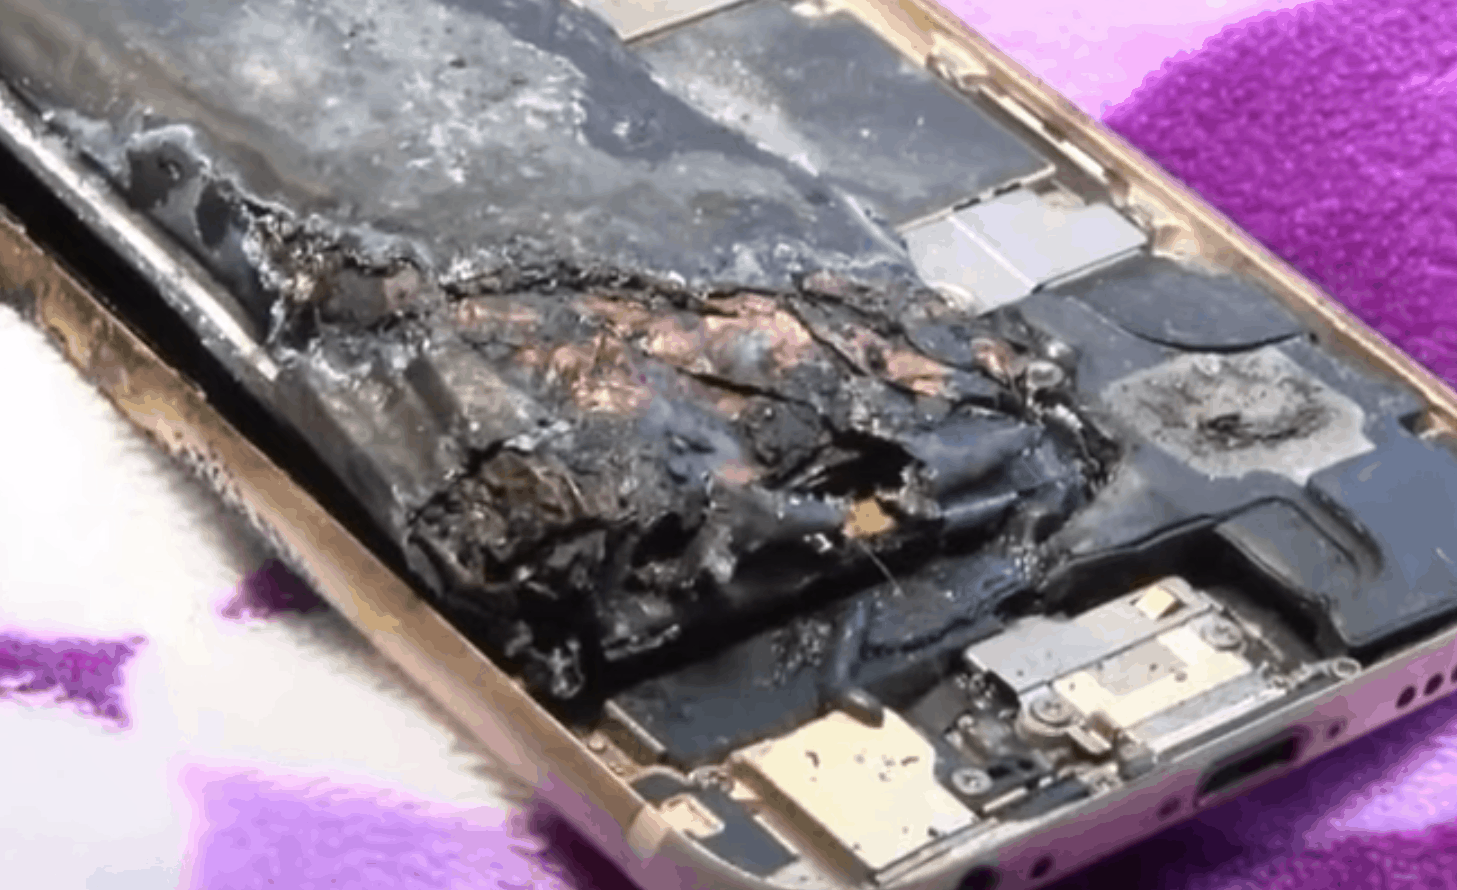 iPhone 6 Fire